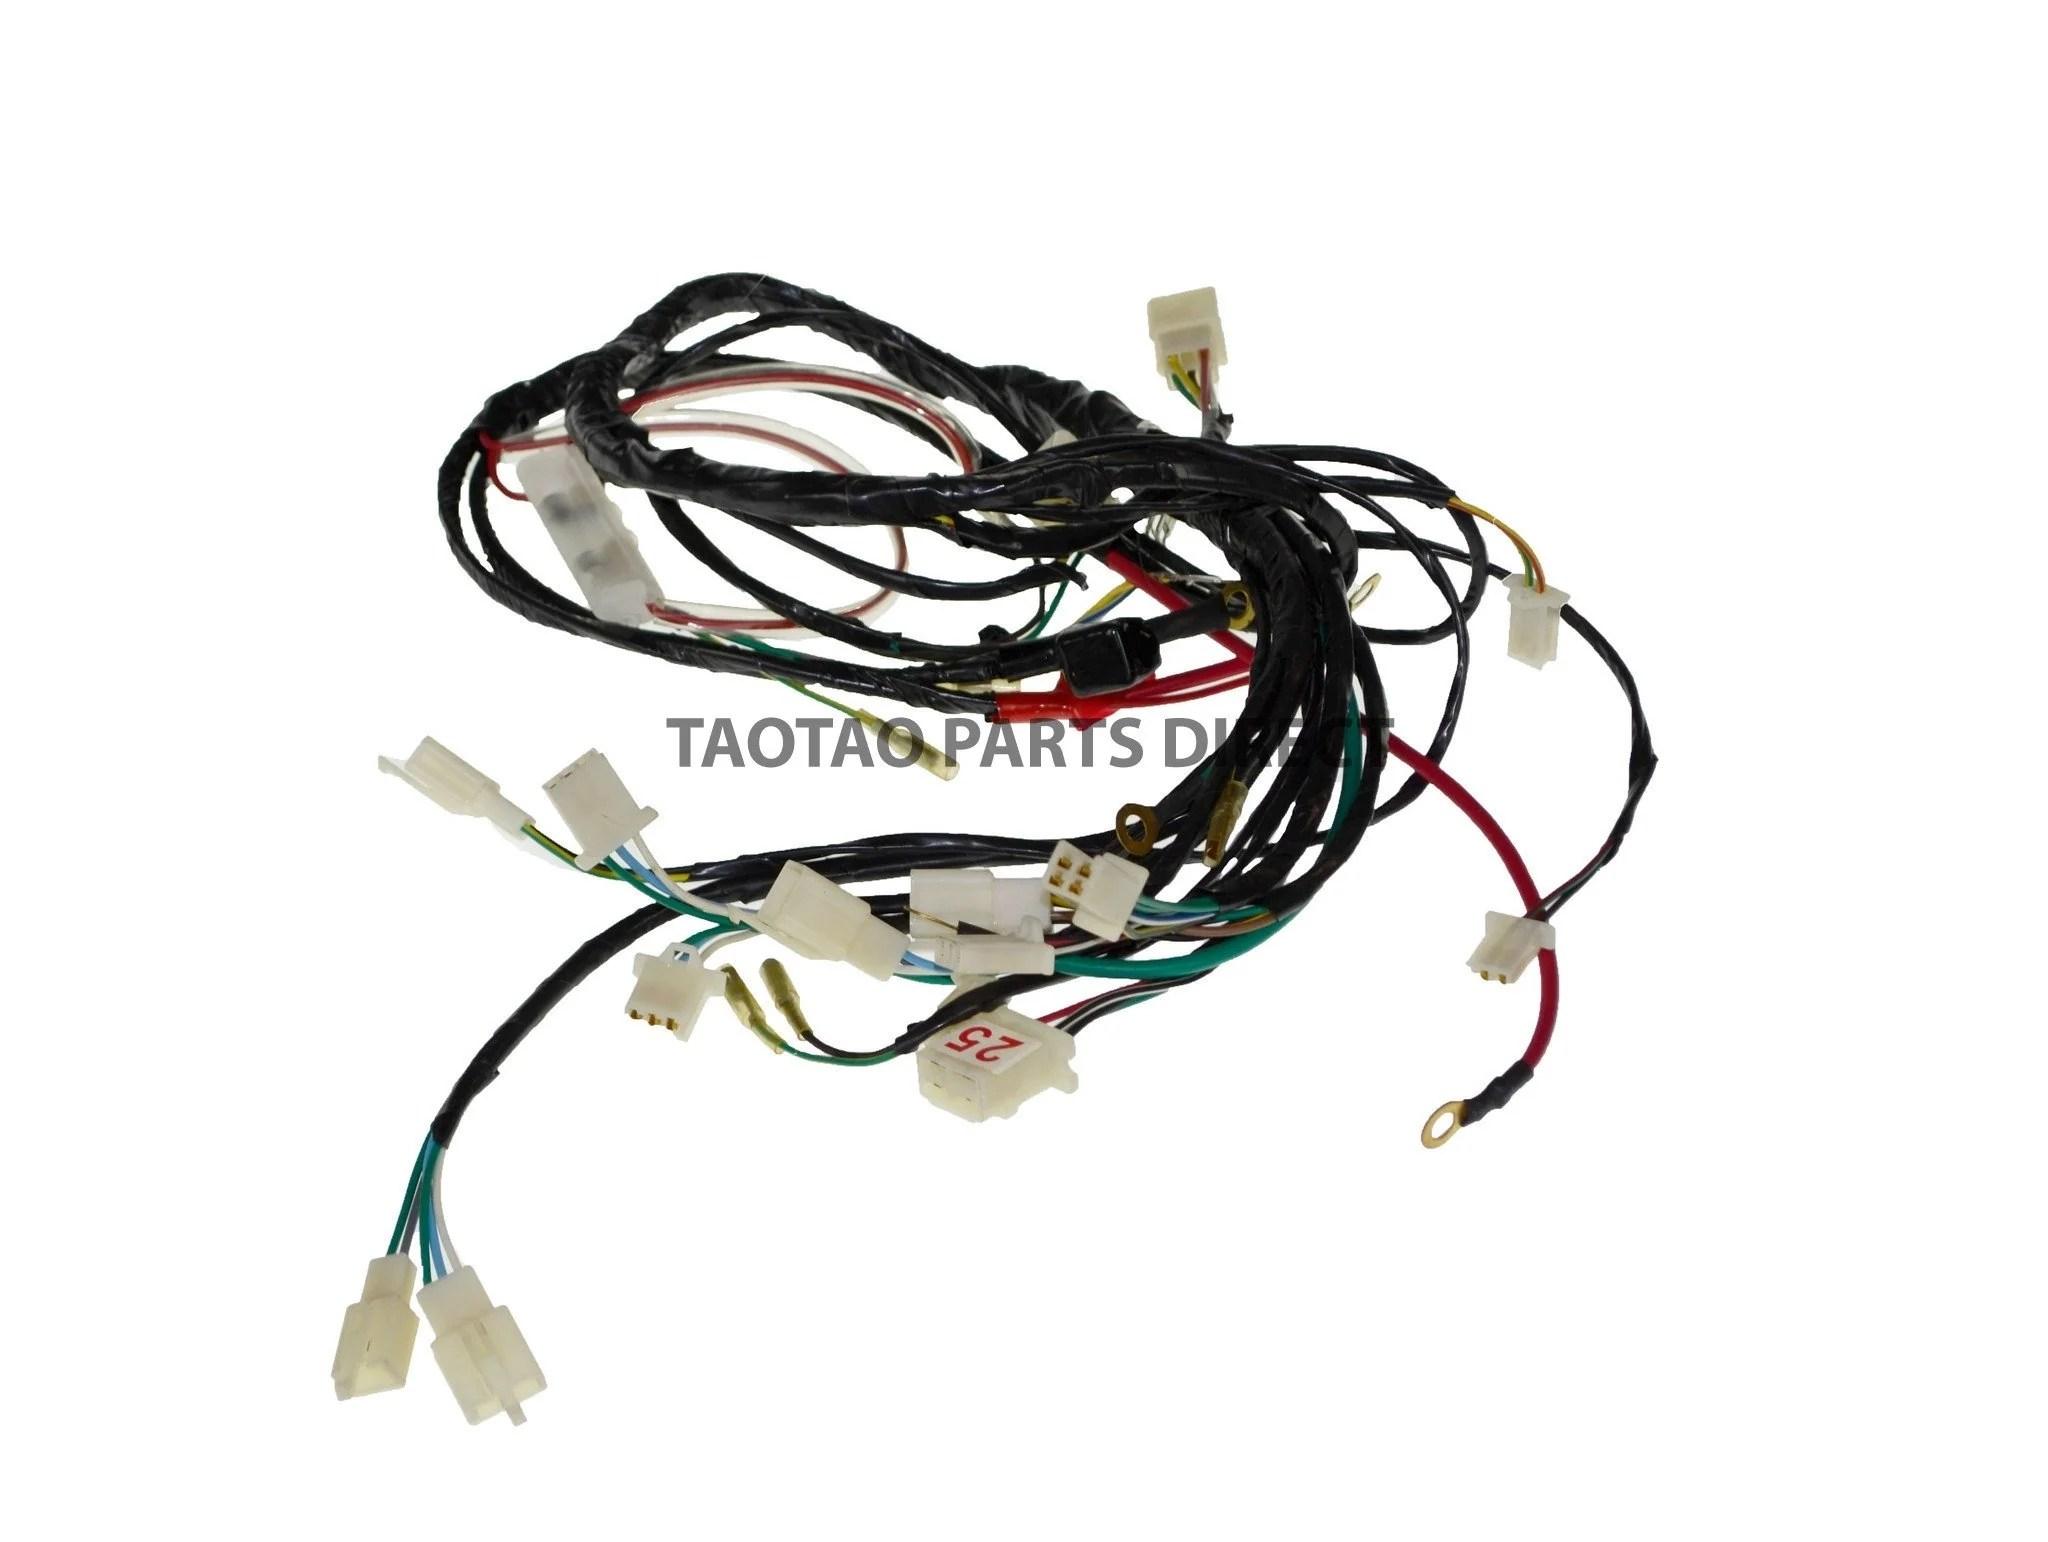 hight resolution of ata250d wire harness 25 taotao parts directatv parts ata250d wire harness 25